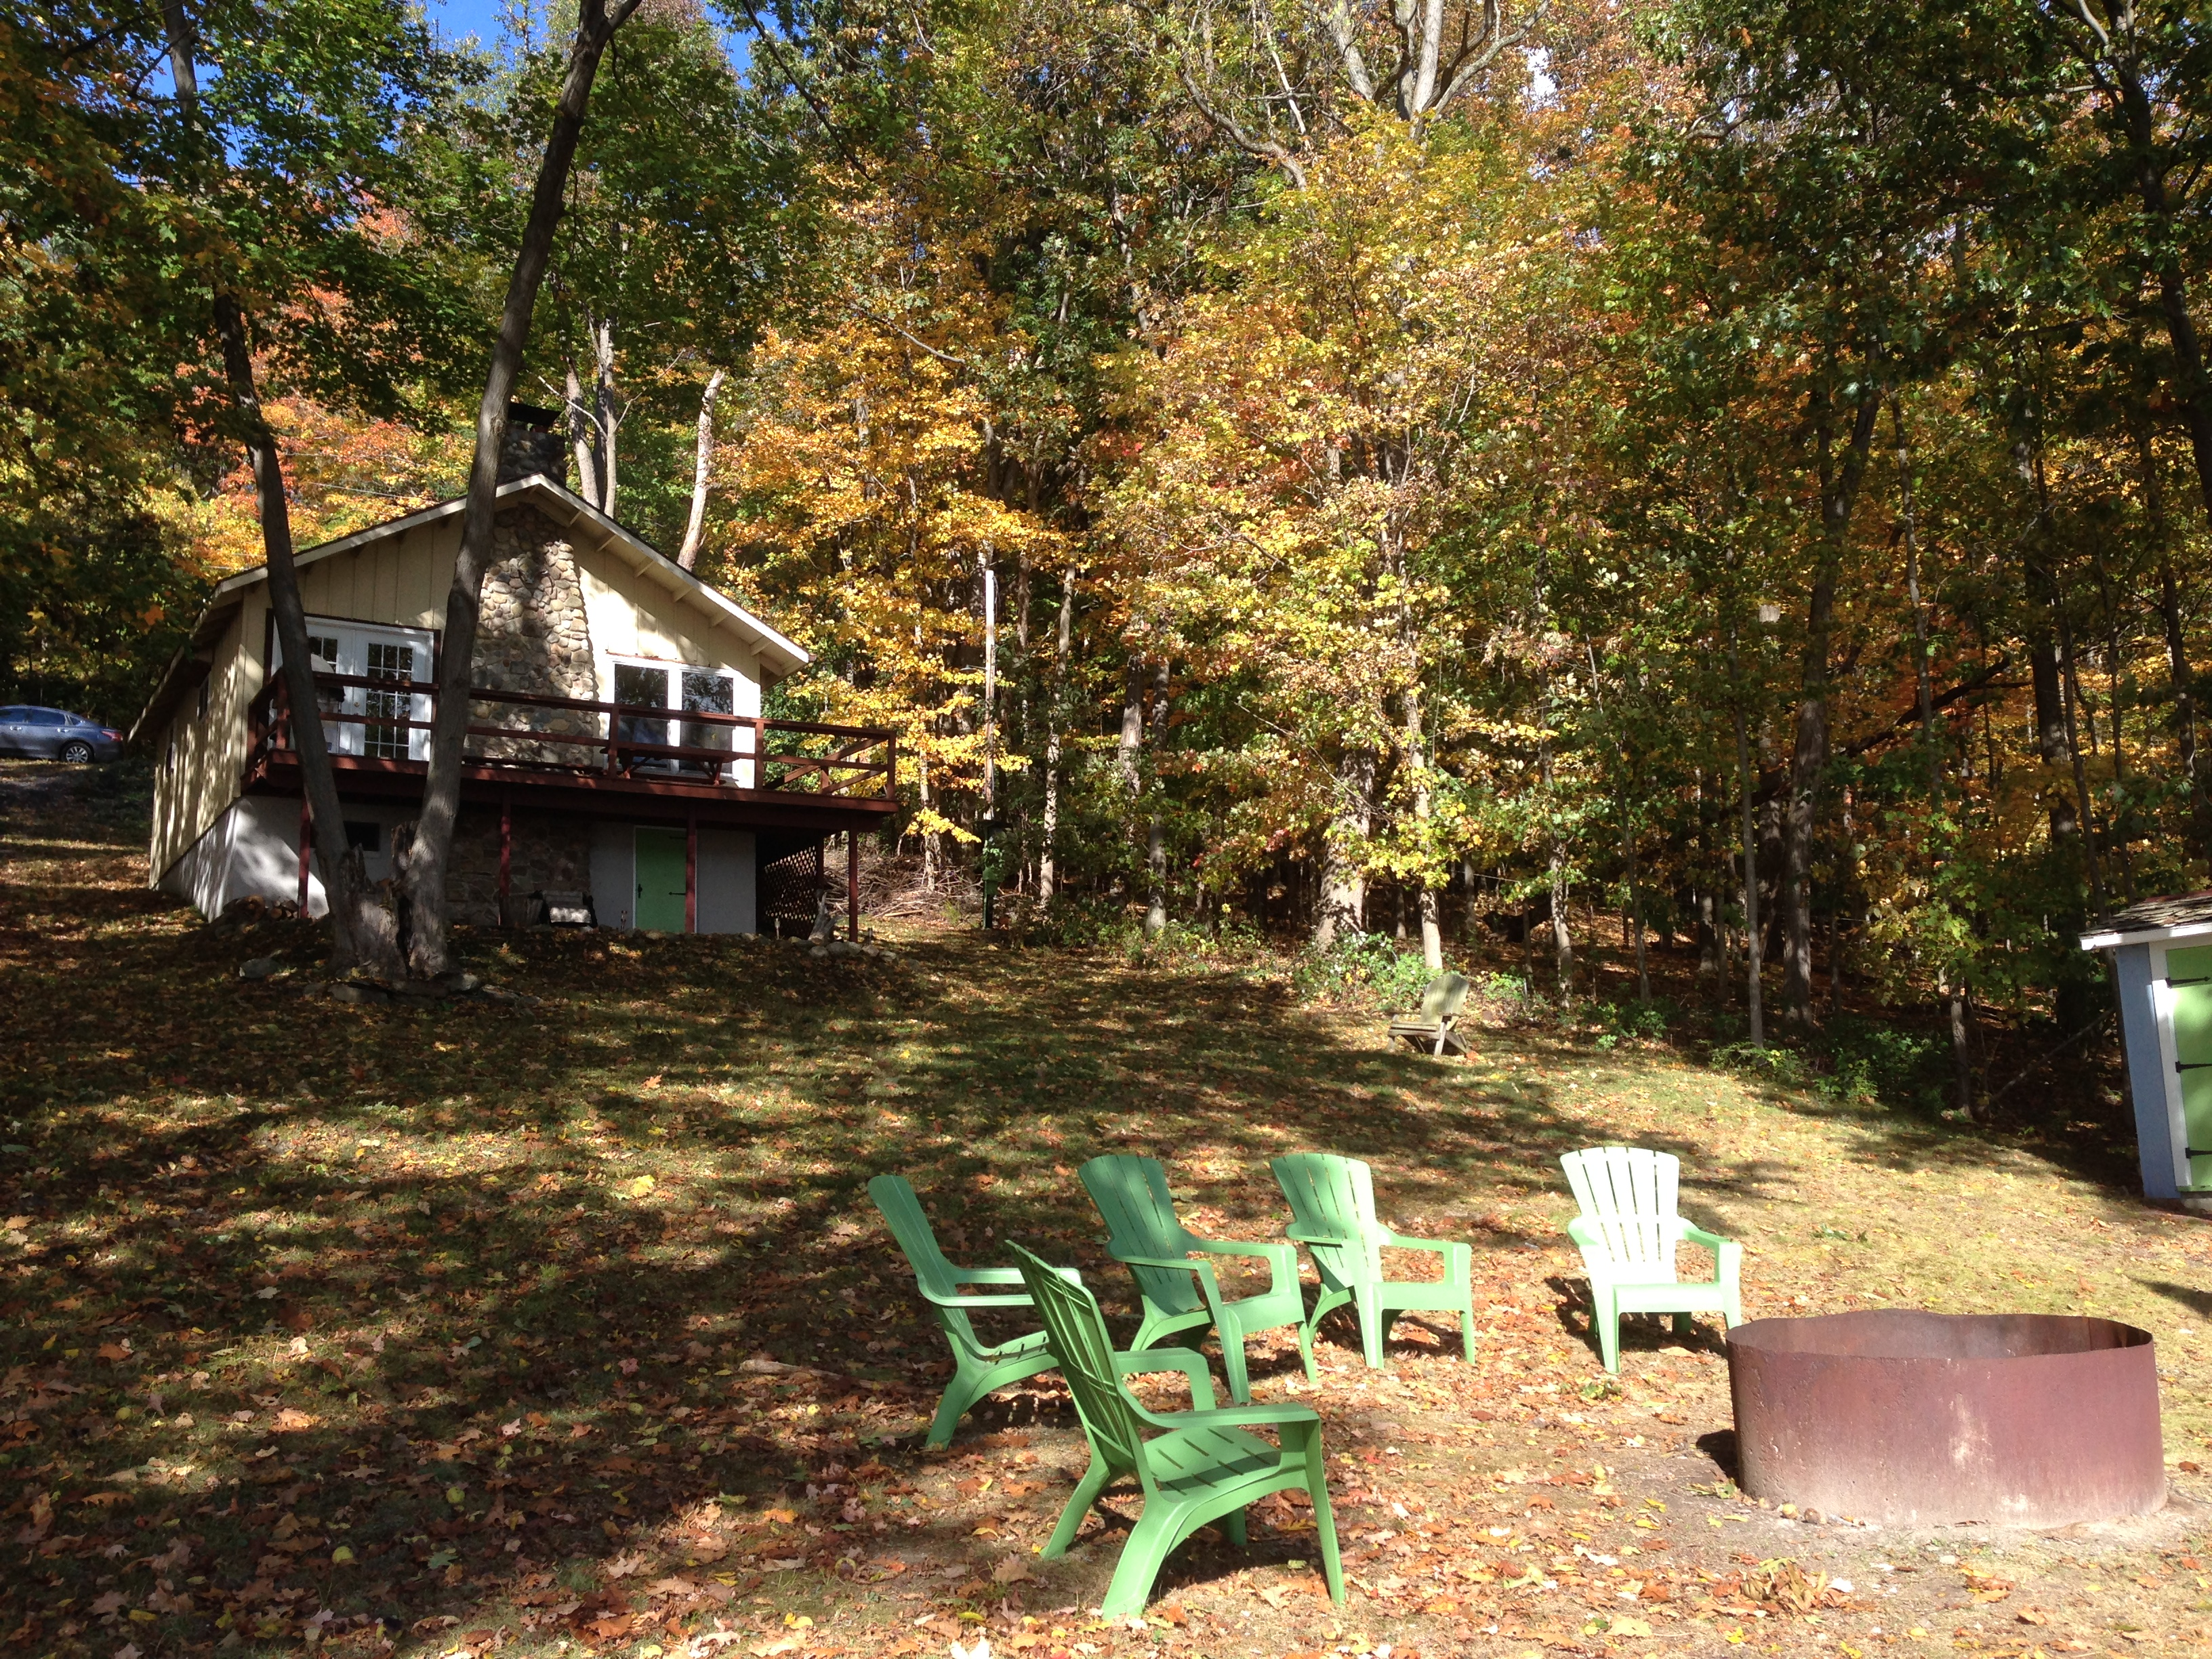 new rentals ohio sunset seneca inspect amish trail high home bay cottage cabins cabin norton aim business yorkus lake